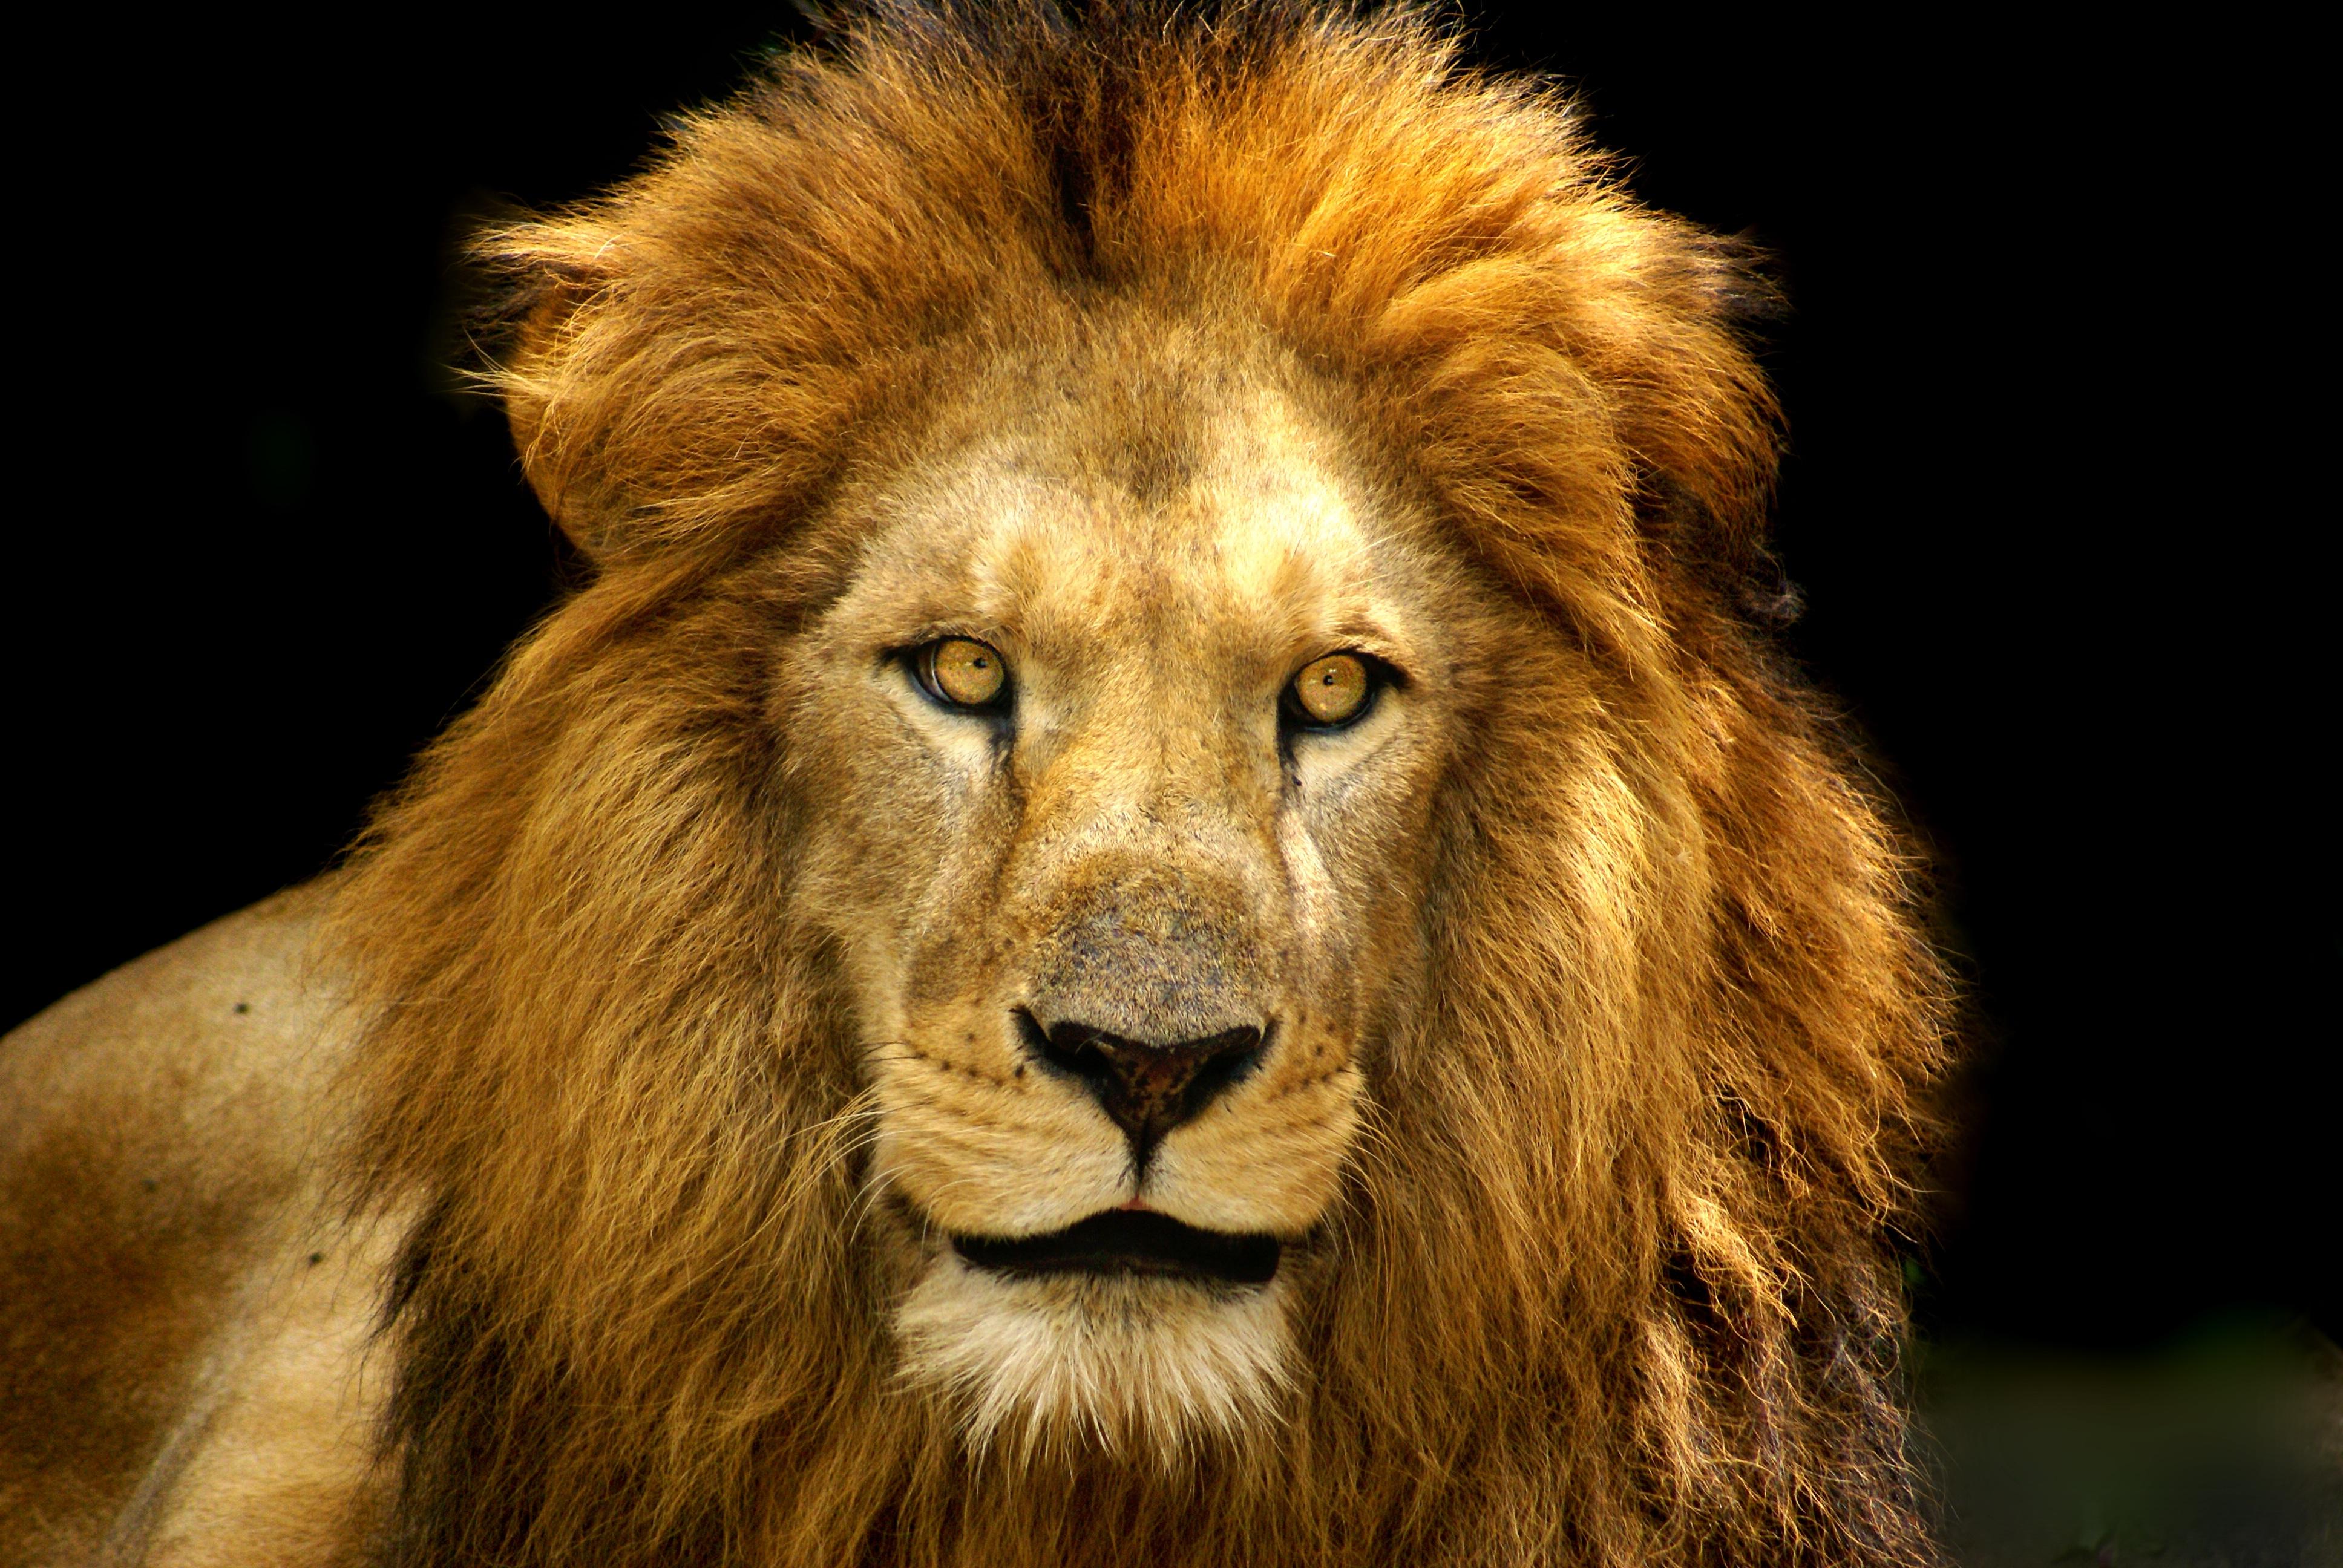 Free Images : wildlife, mane, fauna, savanna, close up